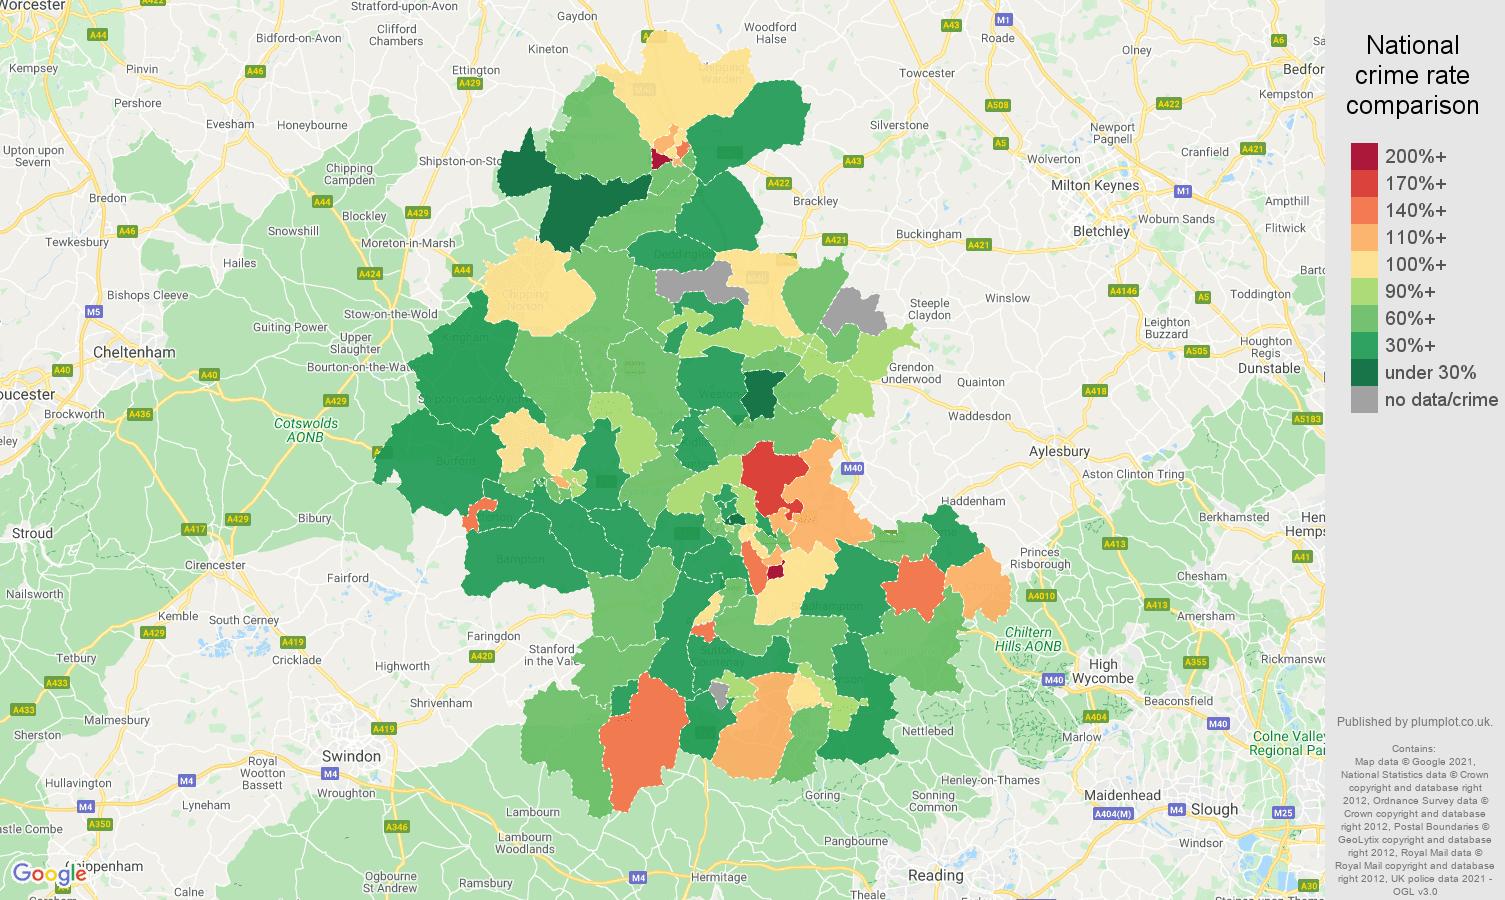 Oxford criminal damage and arson crime rate comparison map